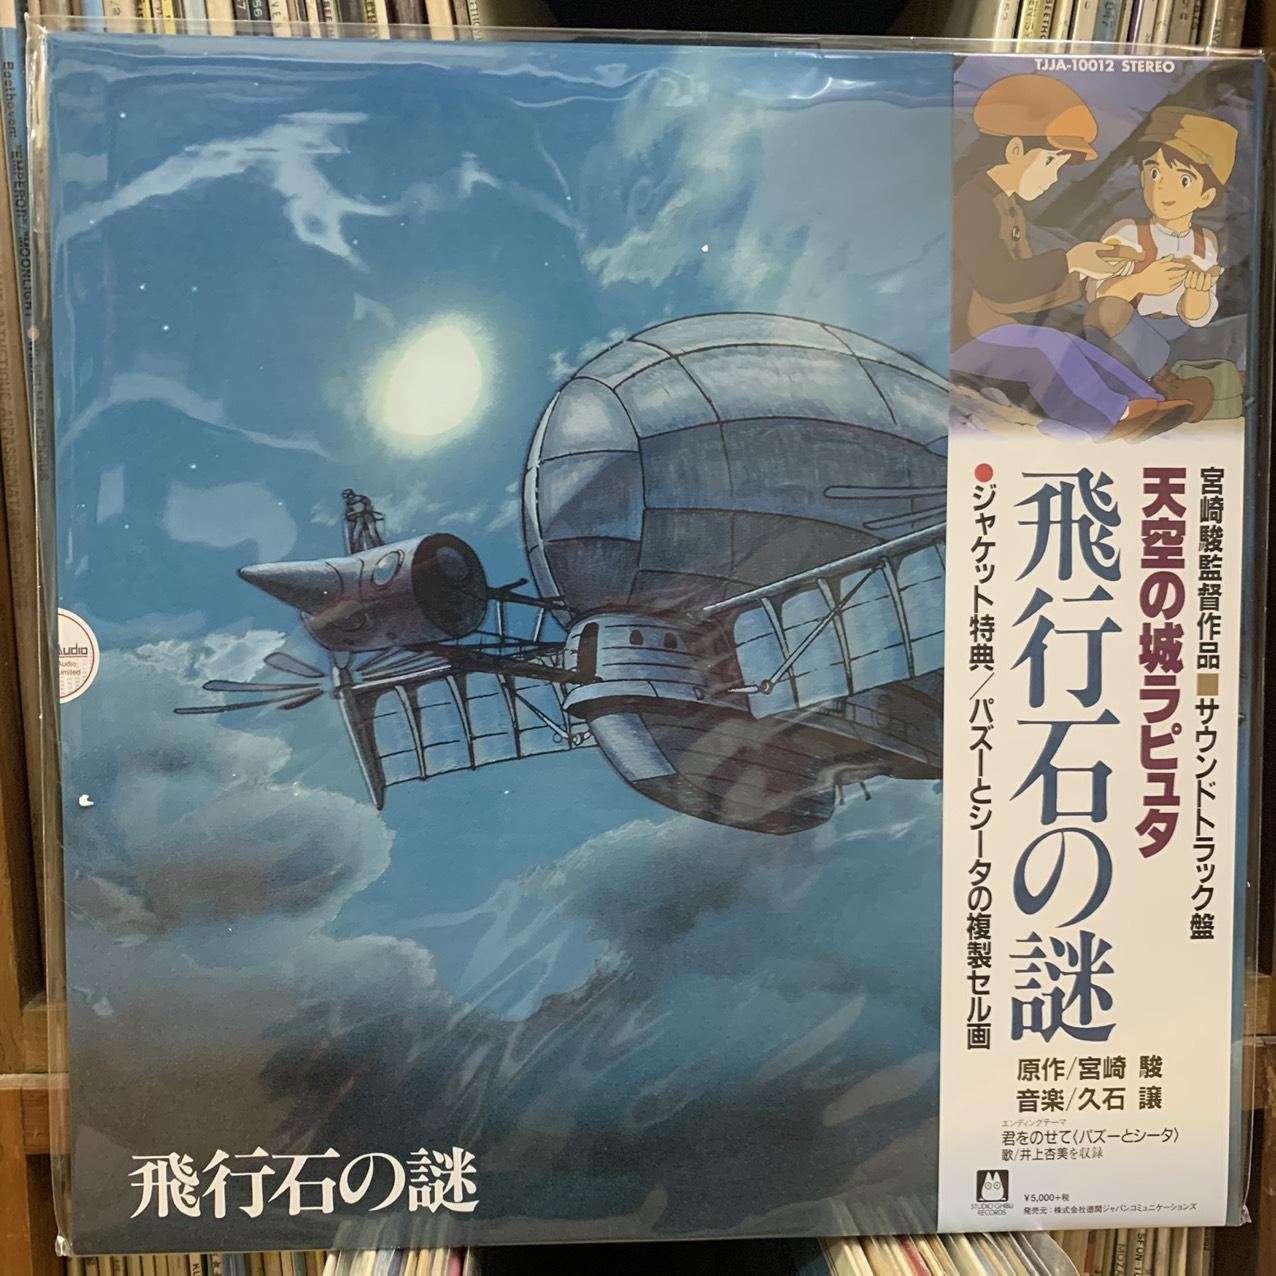 dia-than-lp-lau-dai-tren-khong-soundtrack-studio-ghibli